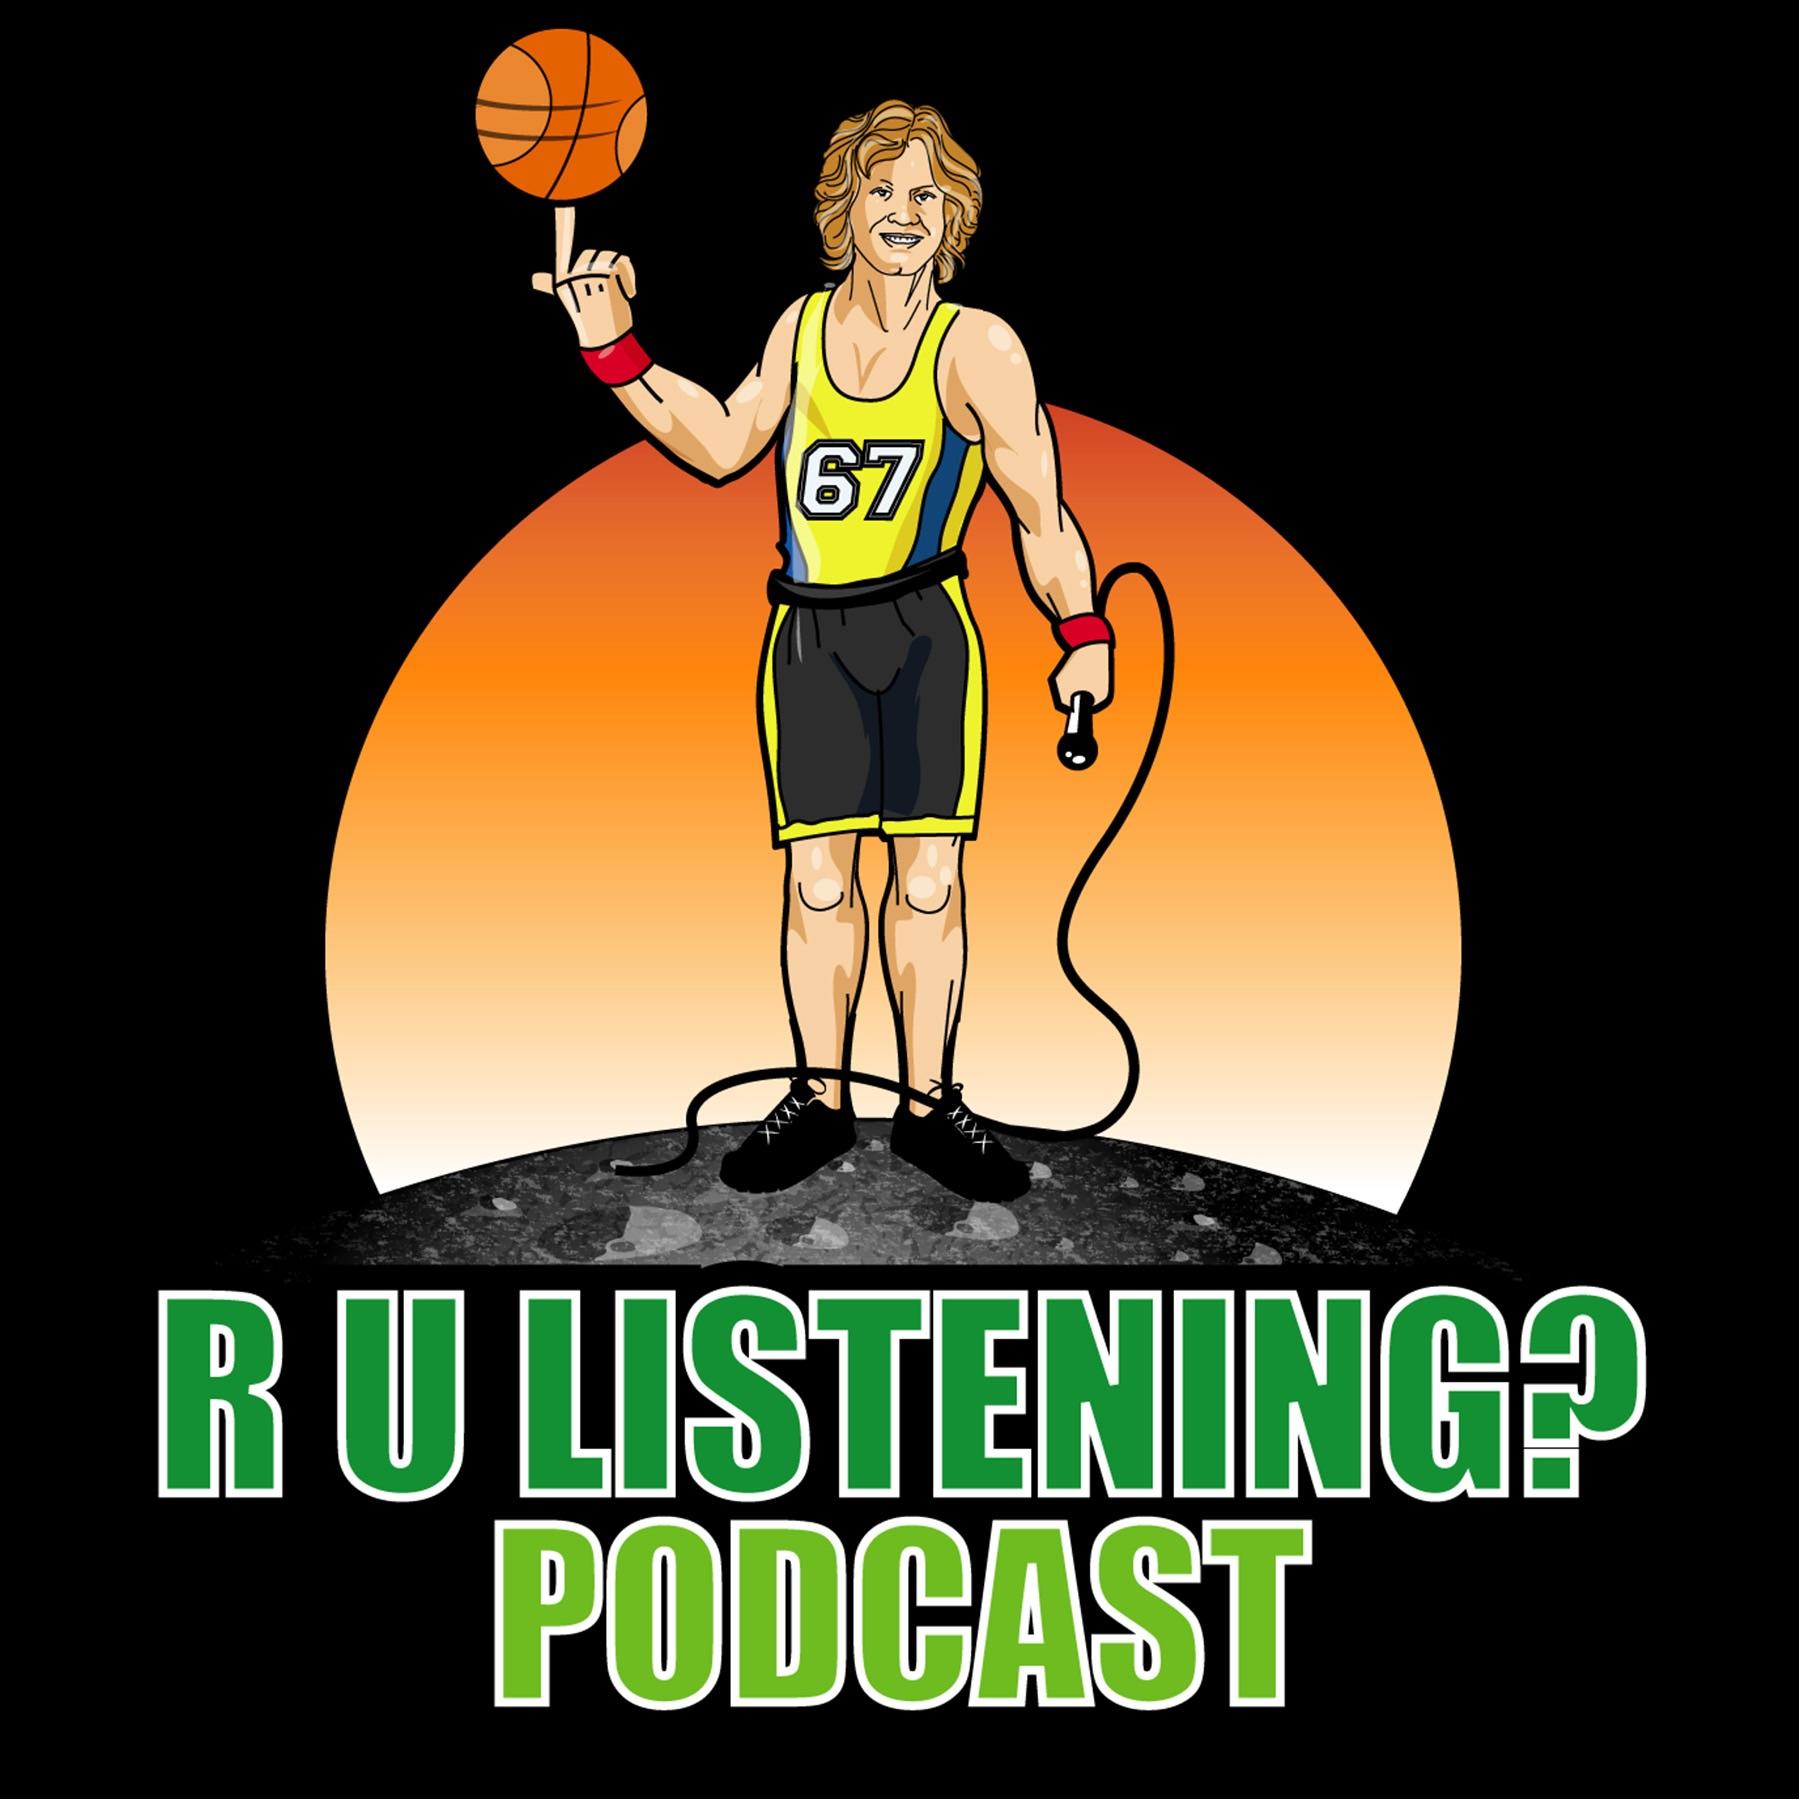 R U LISTENING? Podcast